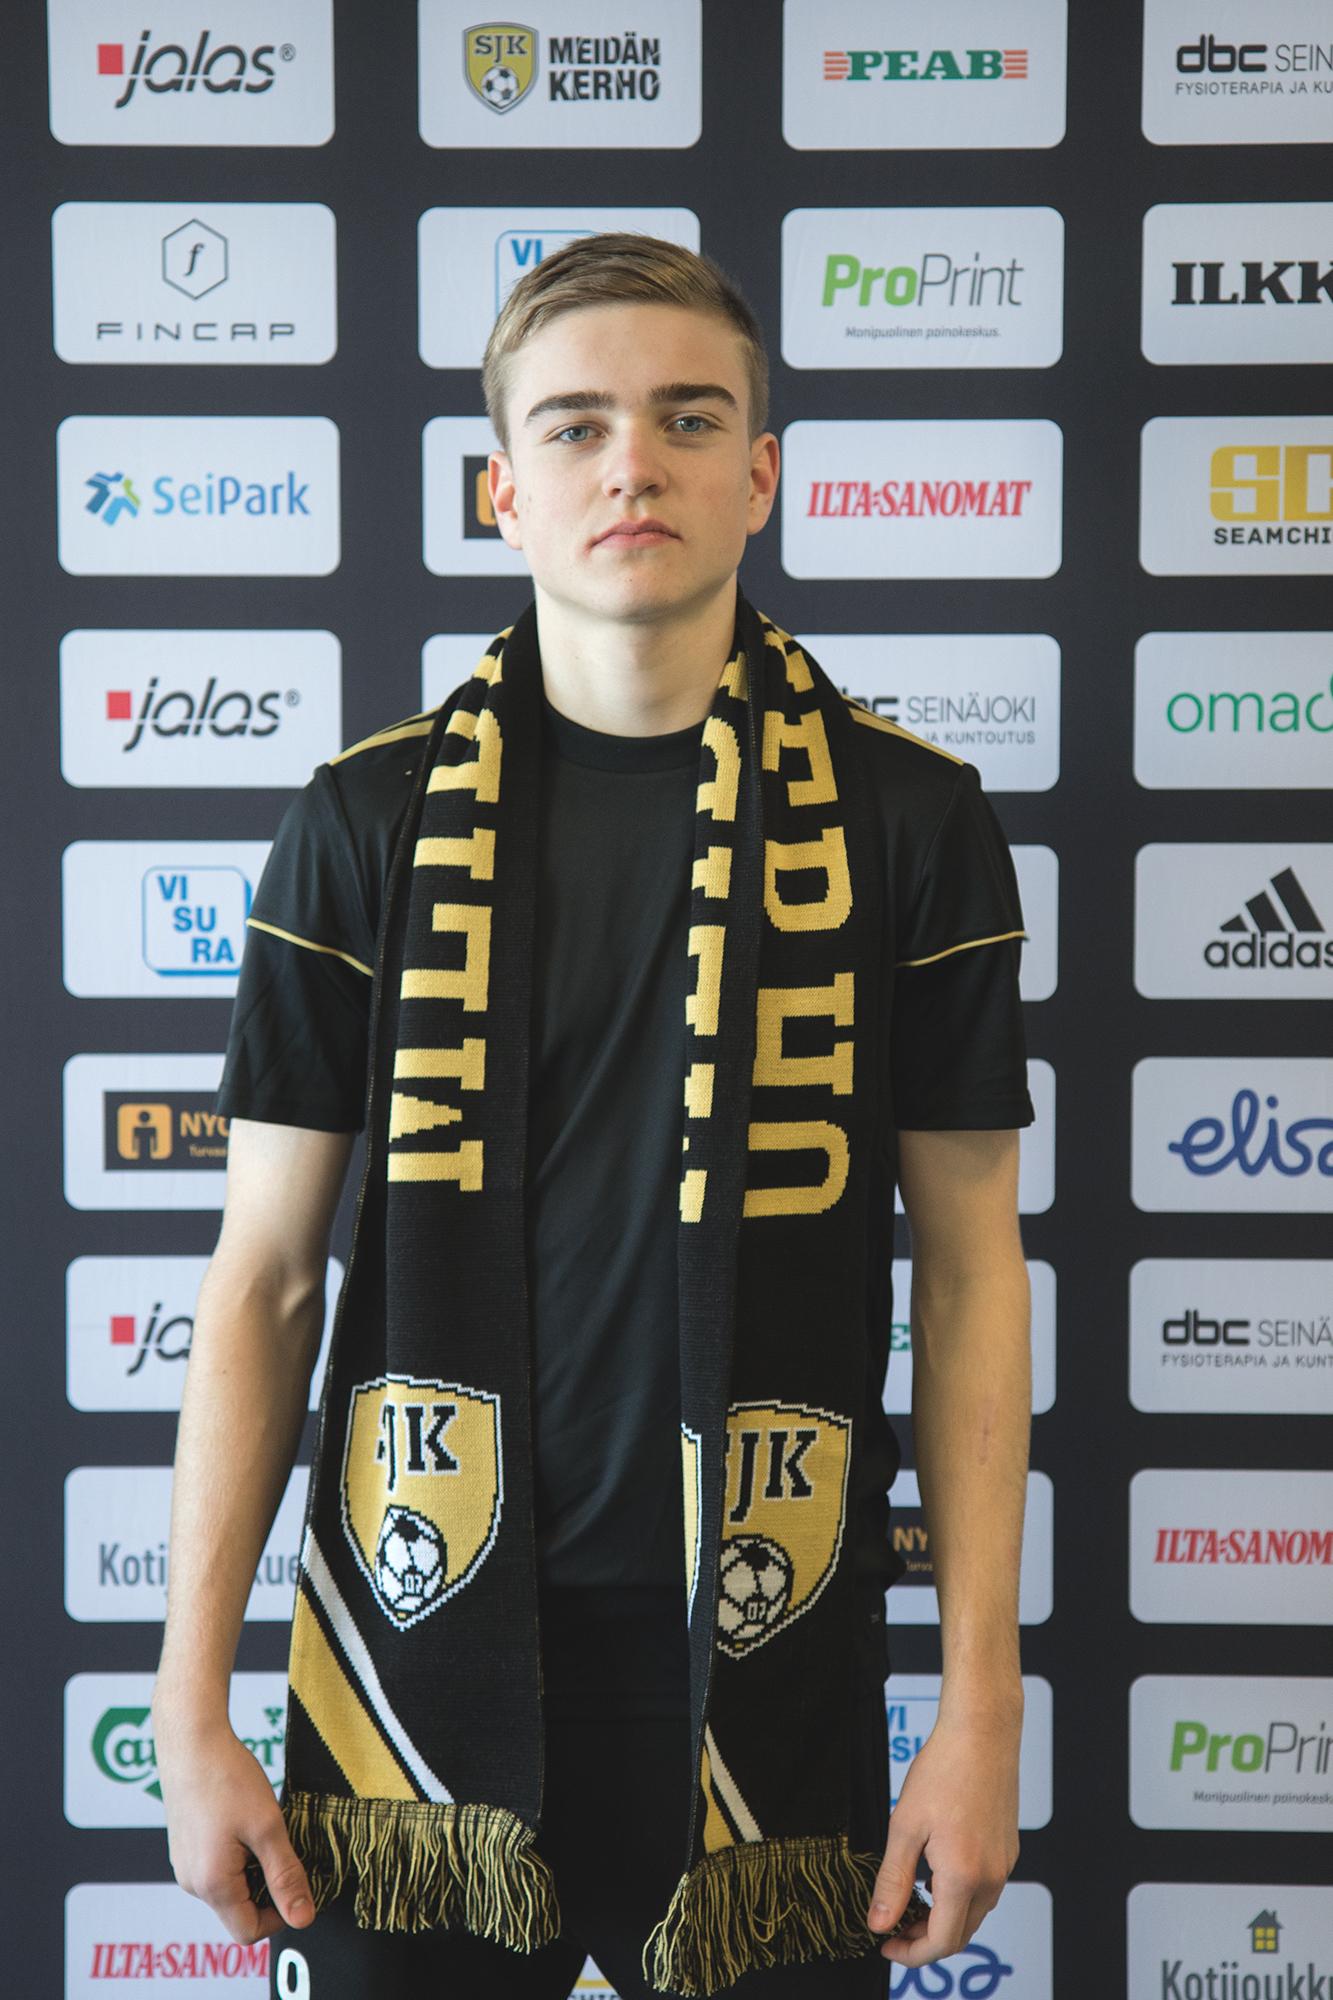 Daniel Håkans